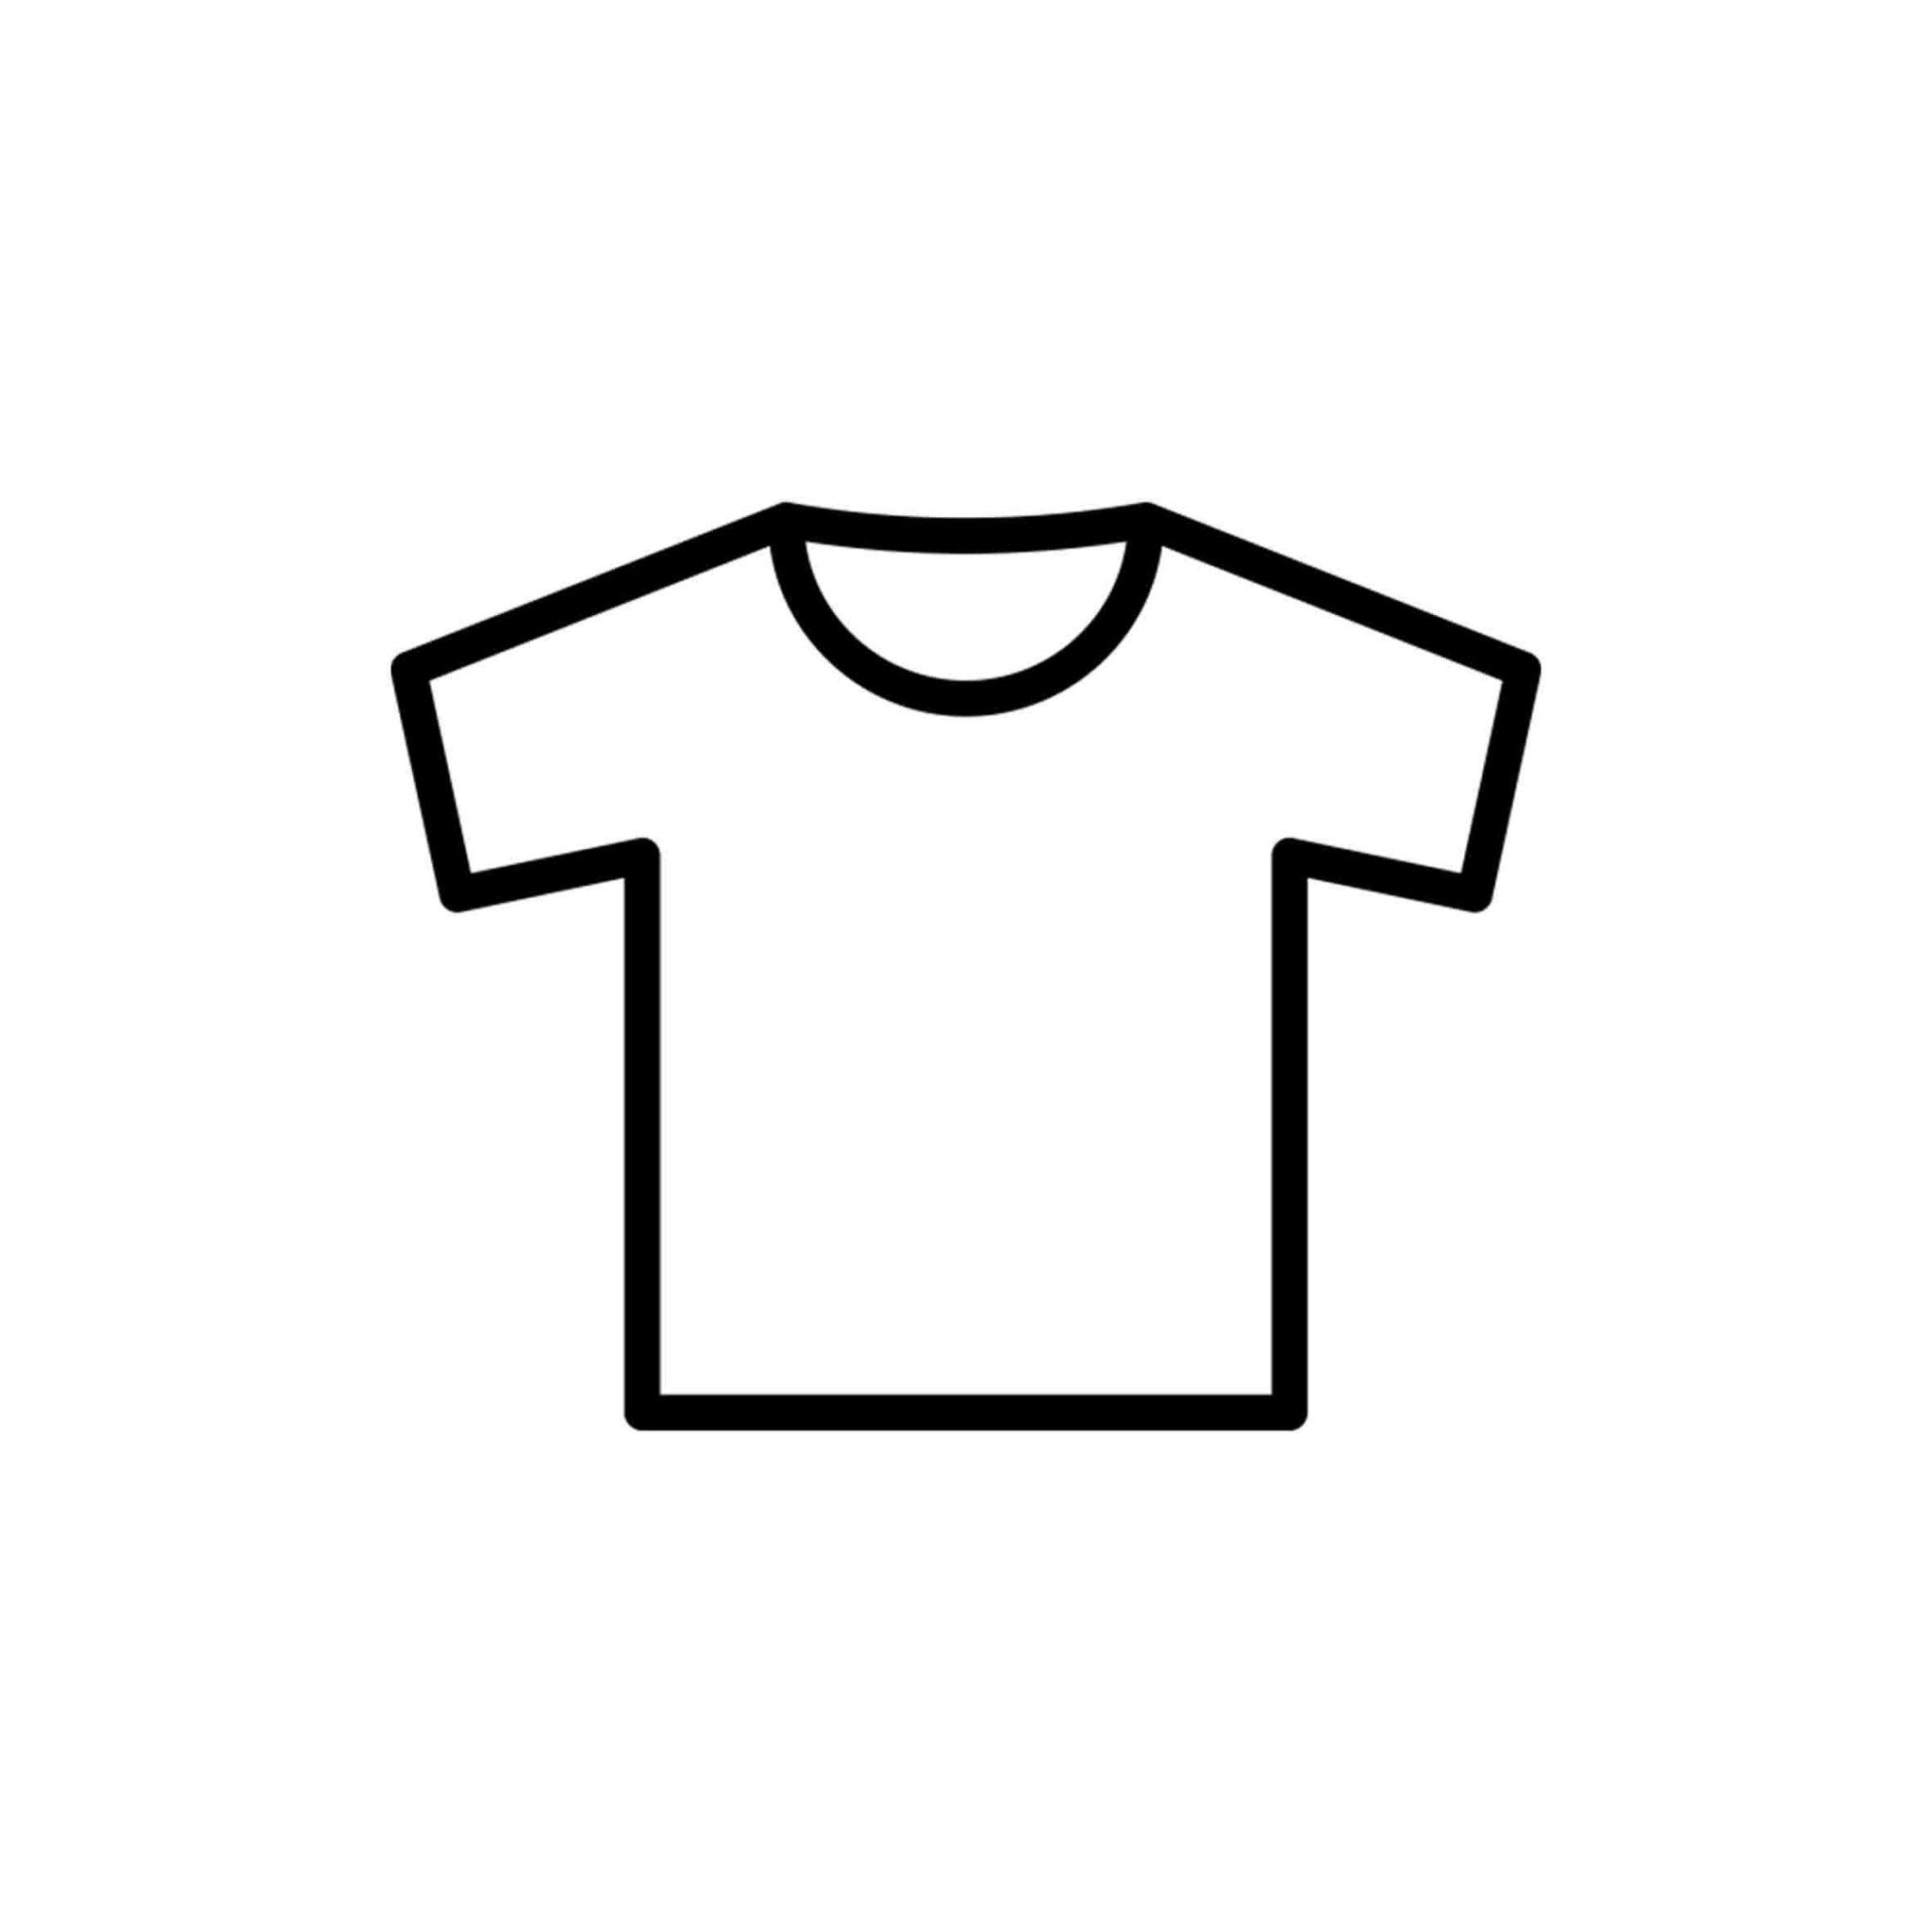 custoimsed t-shirt printing